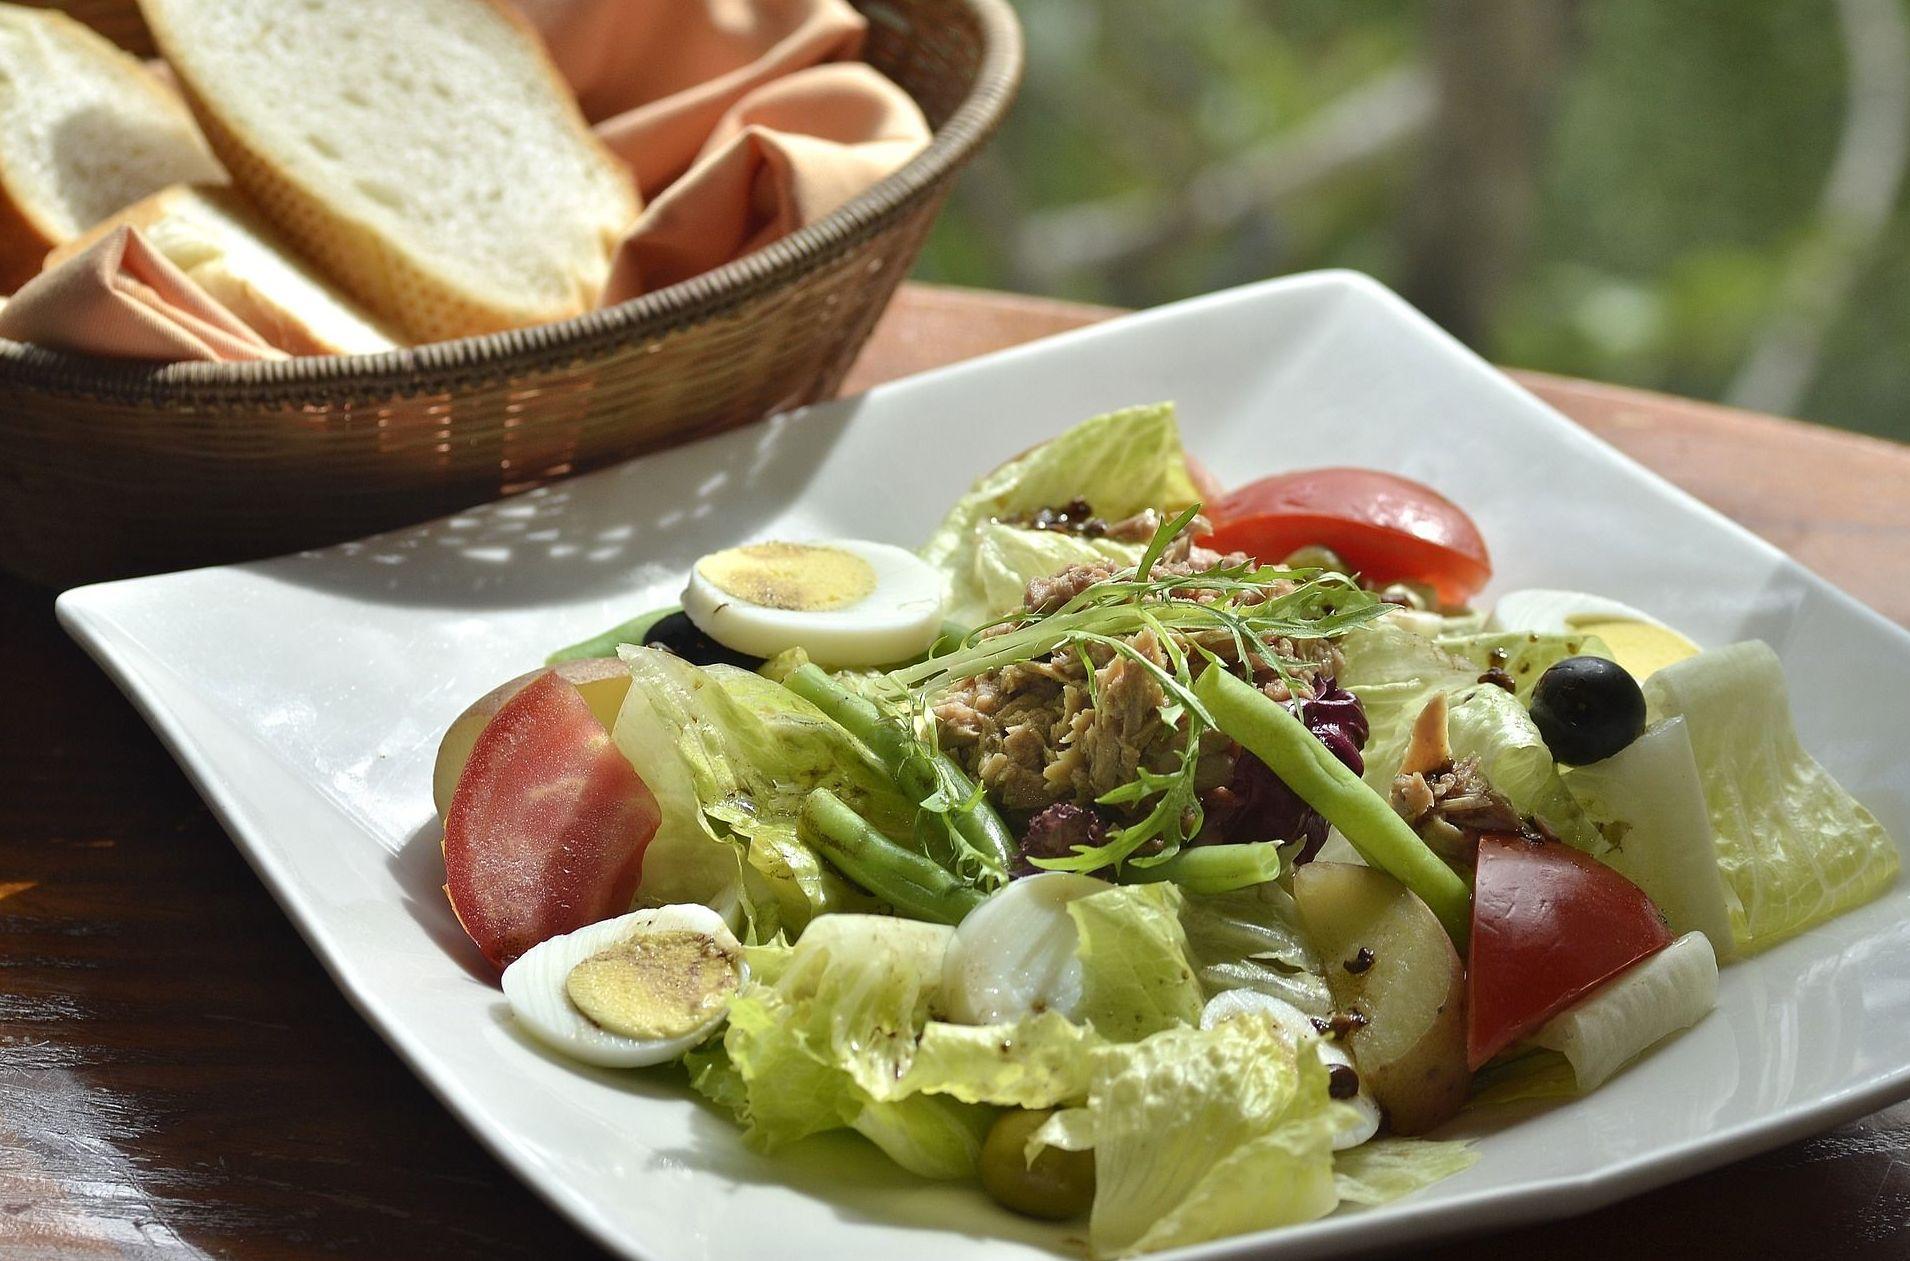 Buenas ensaladas